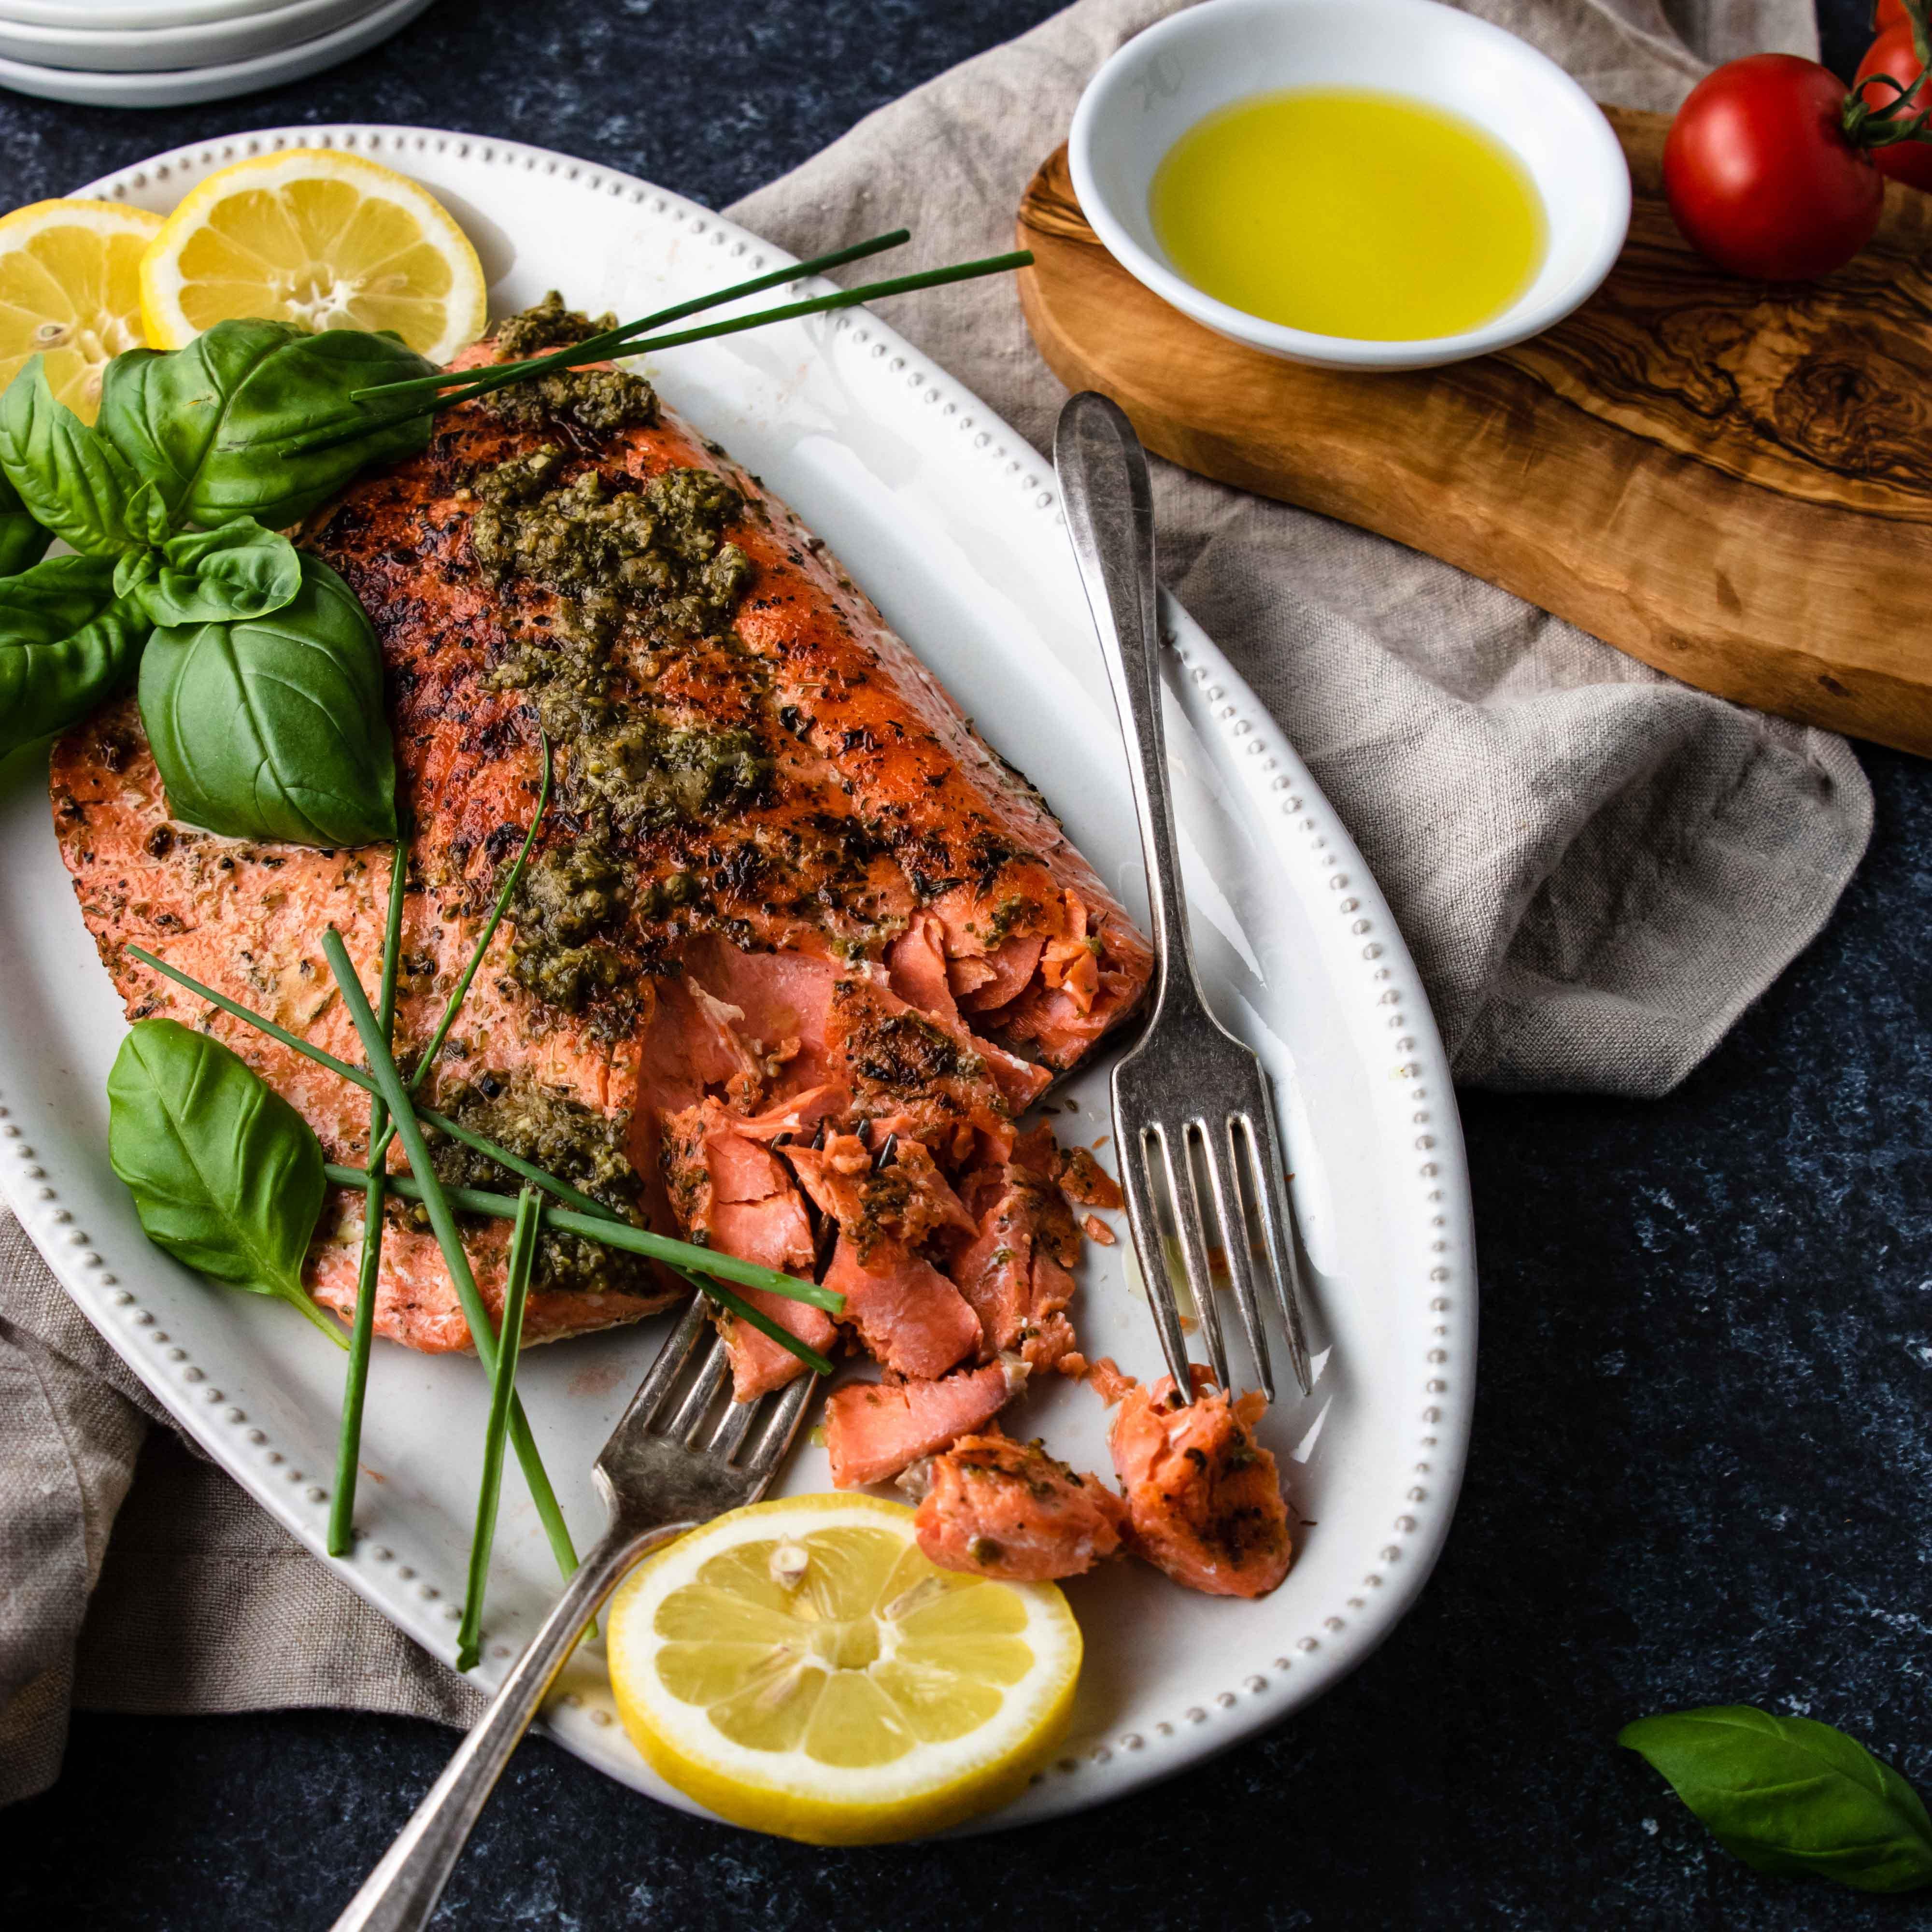 Baked Salmon Food Photo